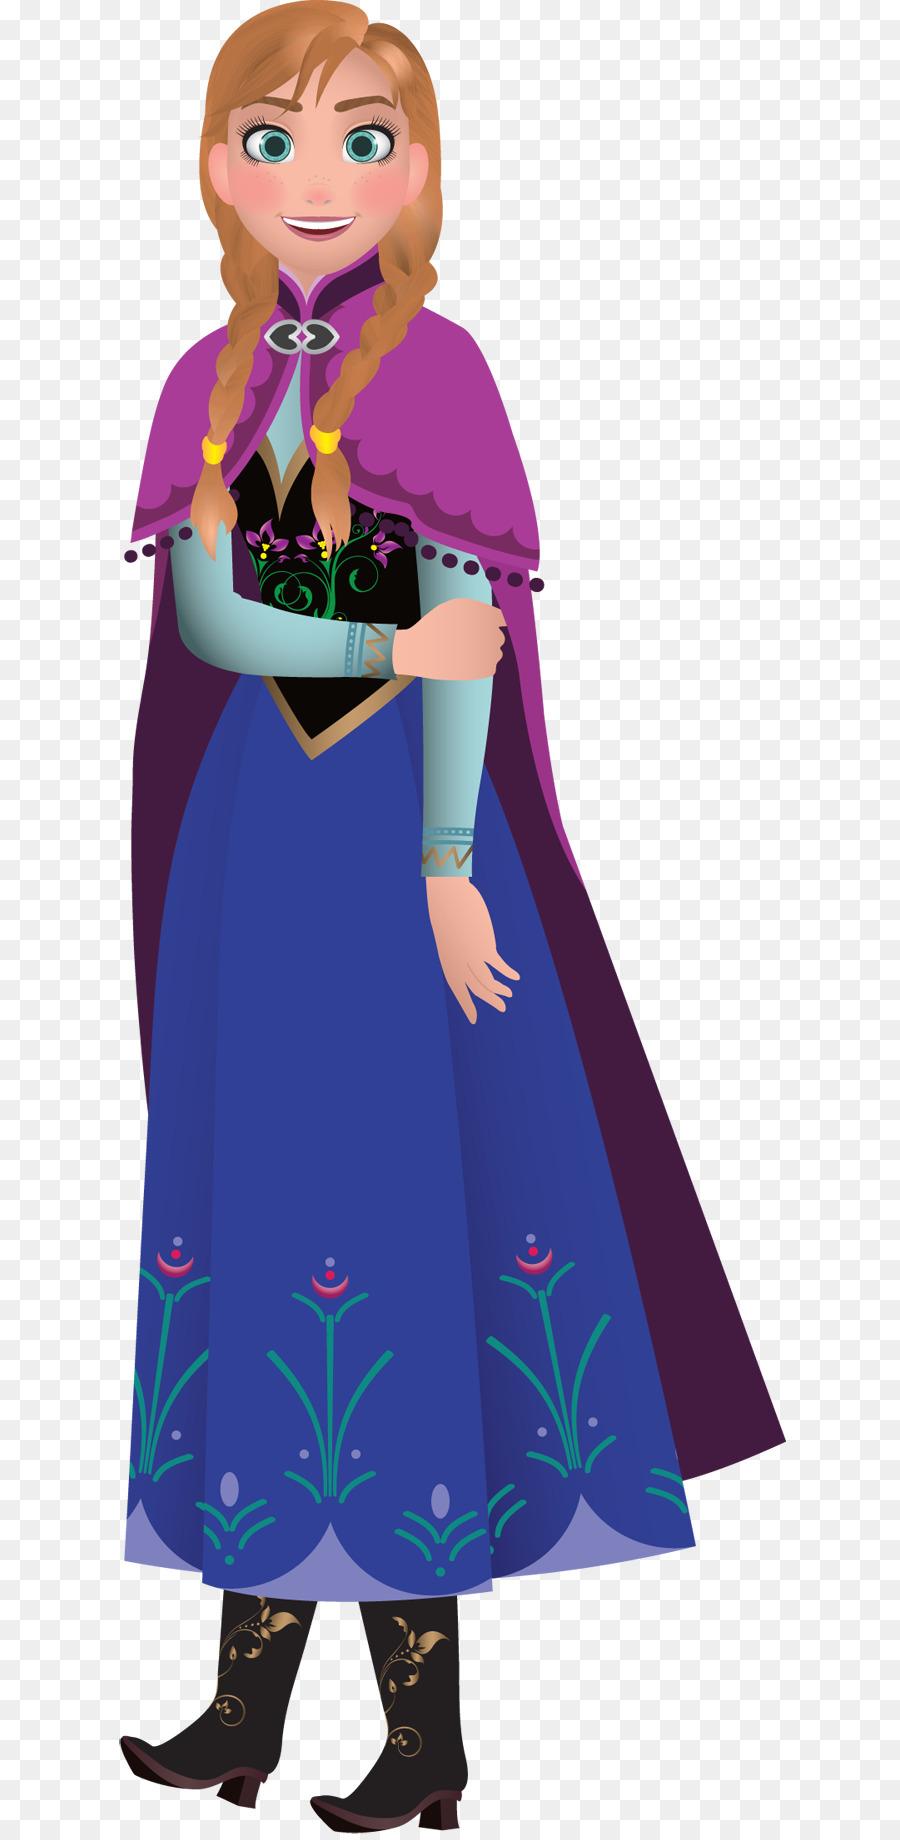 Frozen Anna Disney Princess Party Birthday Anna Frozen Png